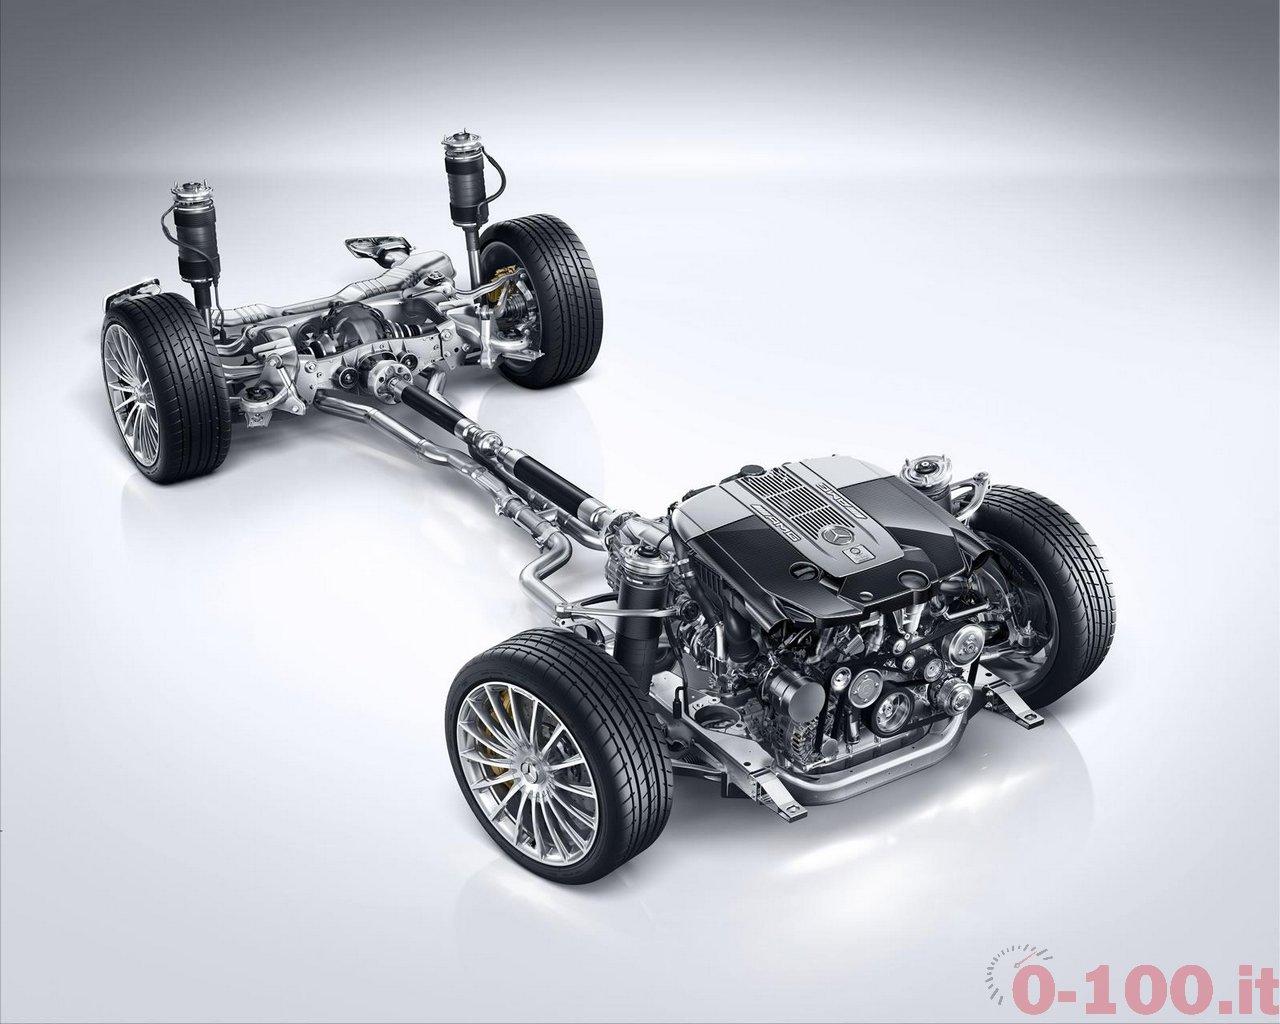 mercedes-s65-amg-coupe-630-cavalli-e-300-orari-0-100_2